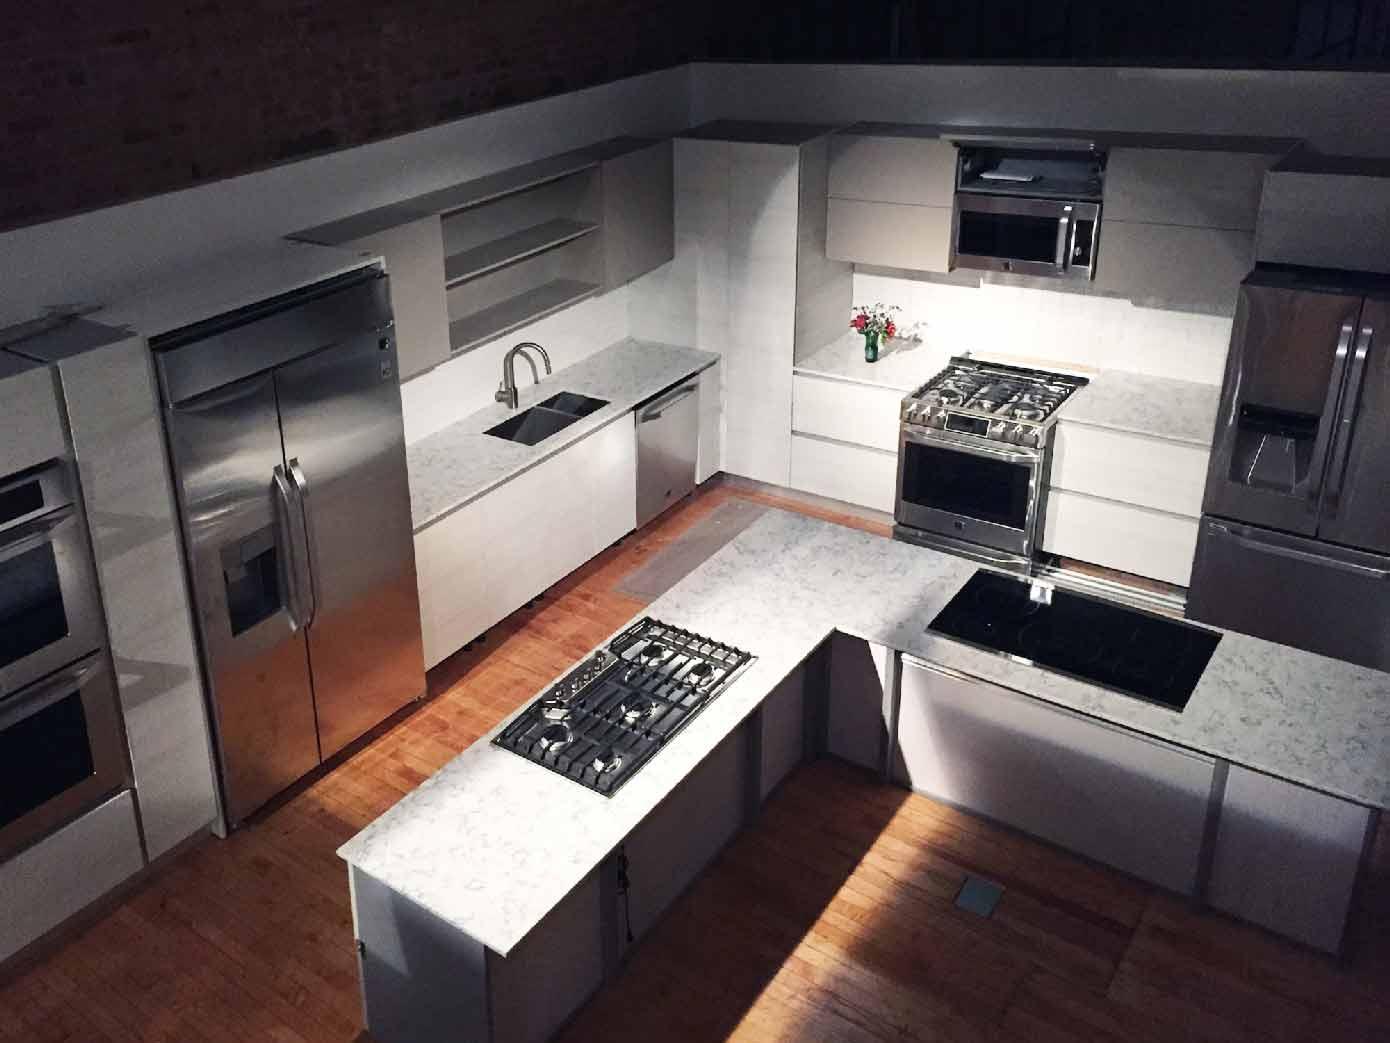 Kitchen studio event Space-Aerial-View